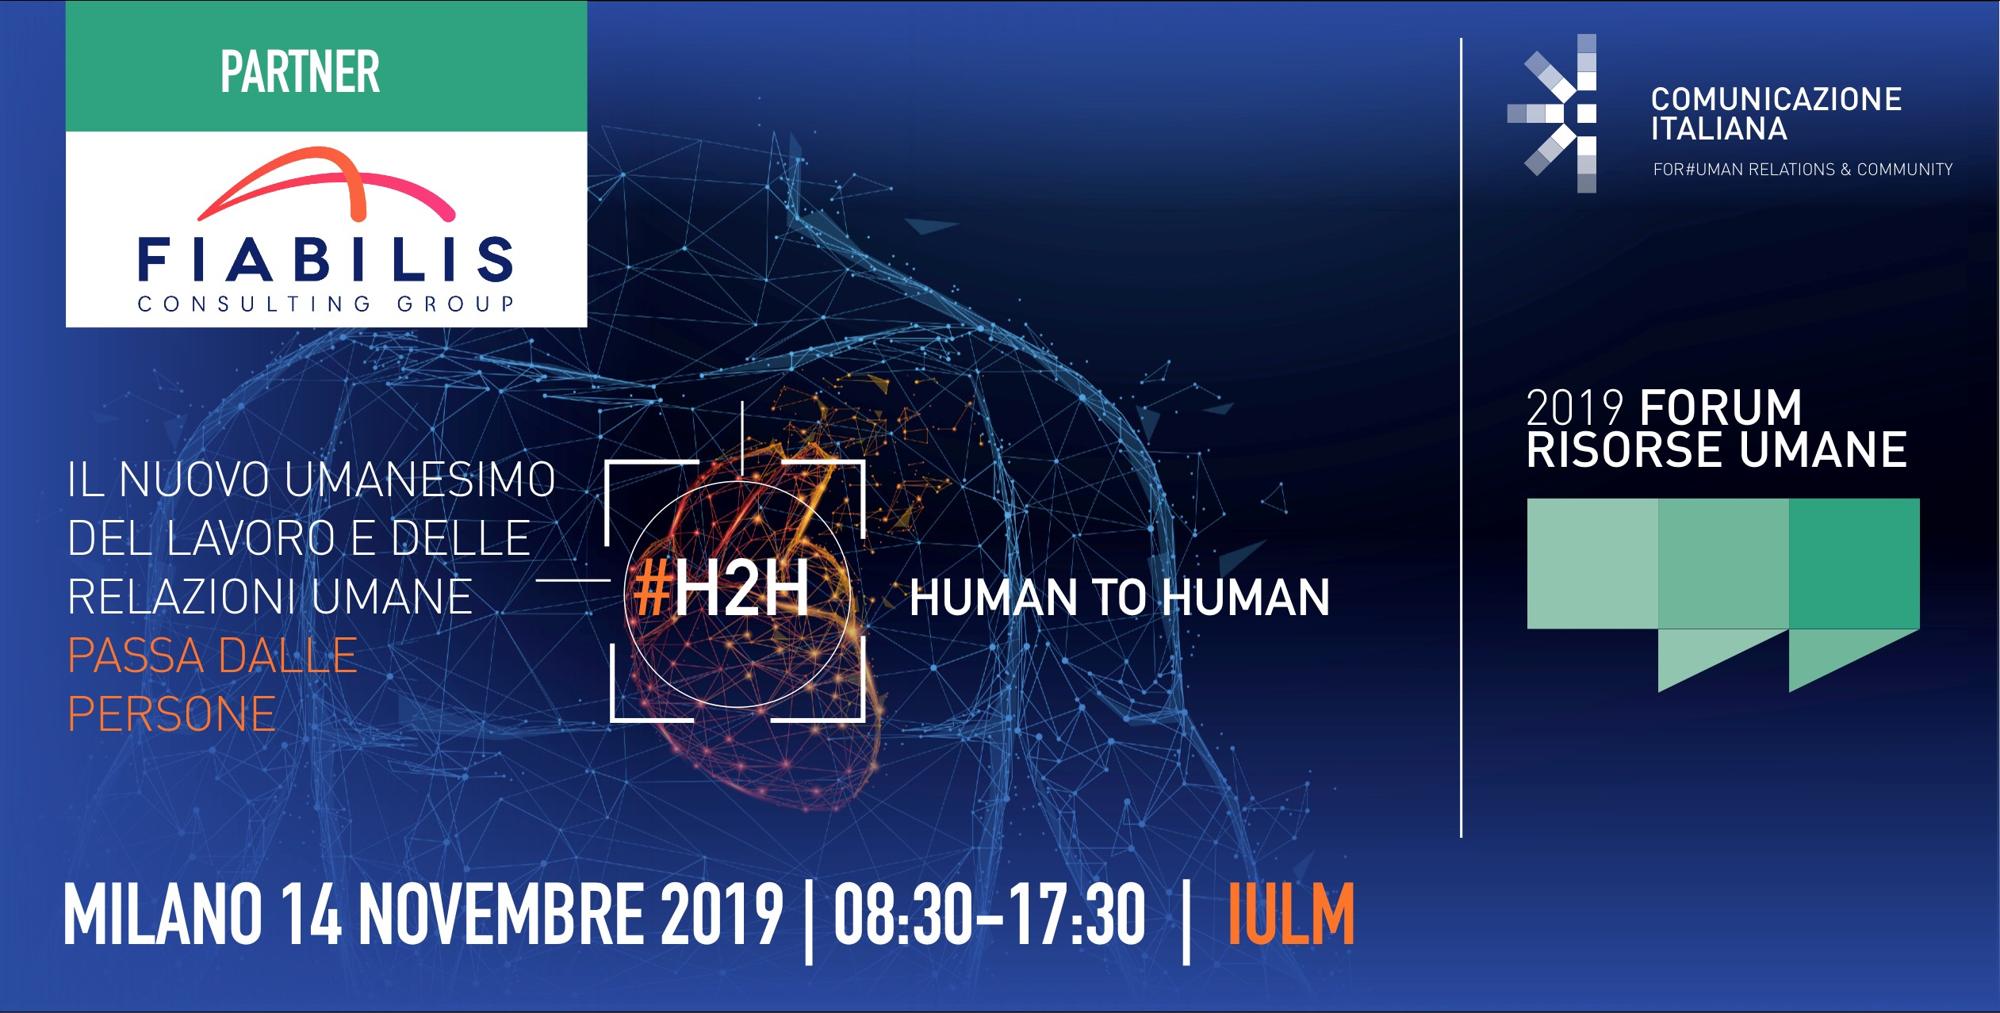 Forum delle risorse umane